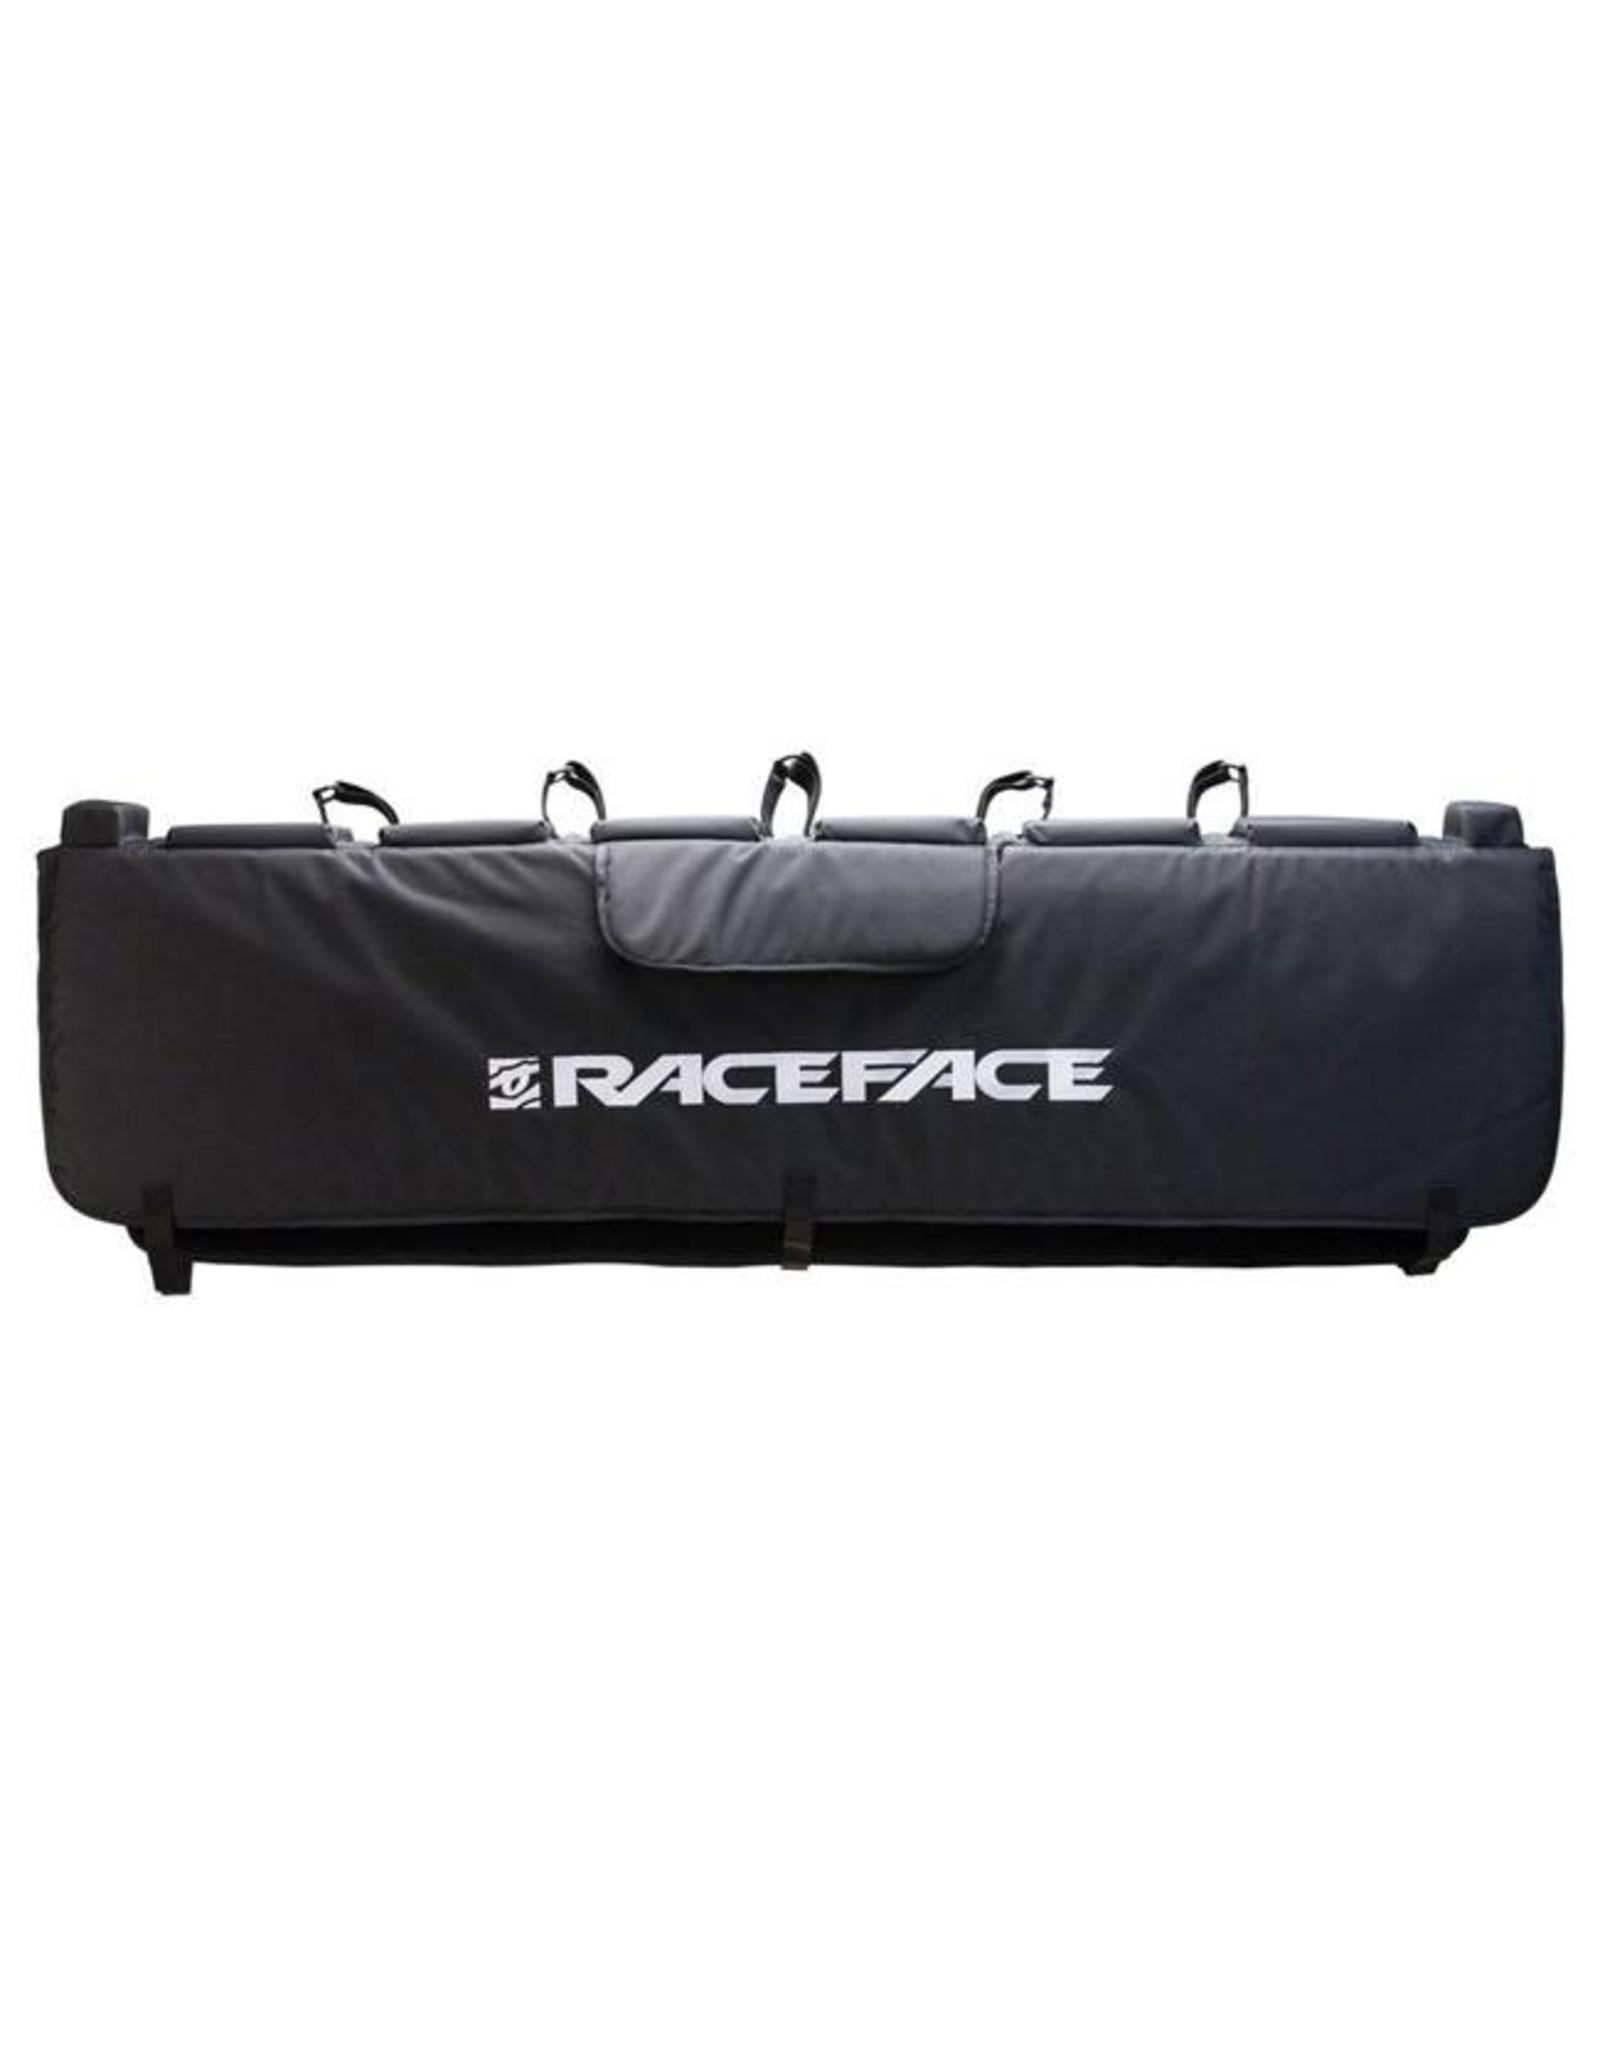 "RaceFace RaceFace Tailgate Pad: 57"" Black SM/MD"